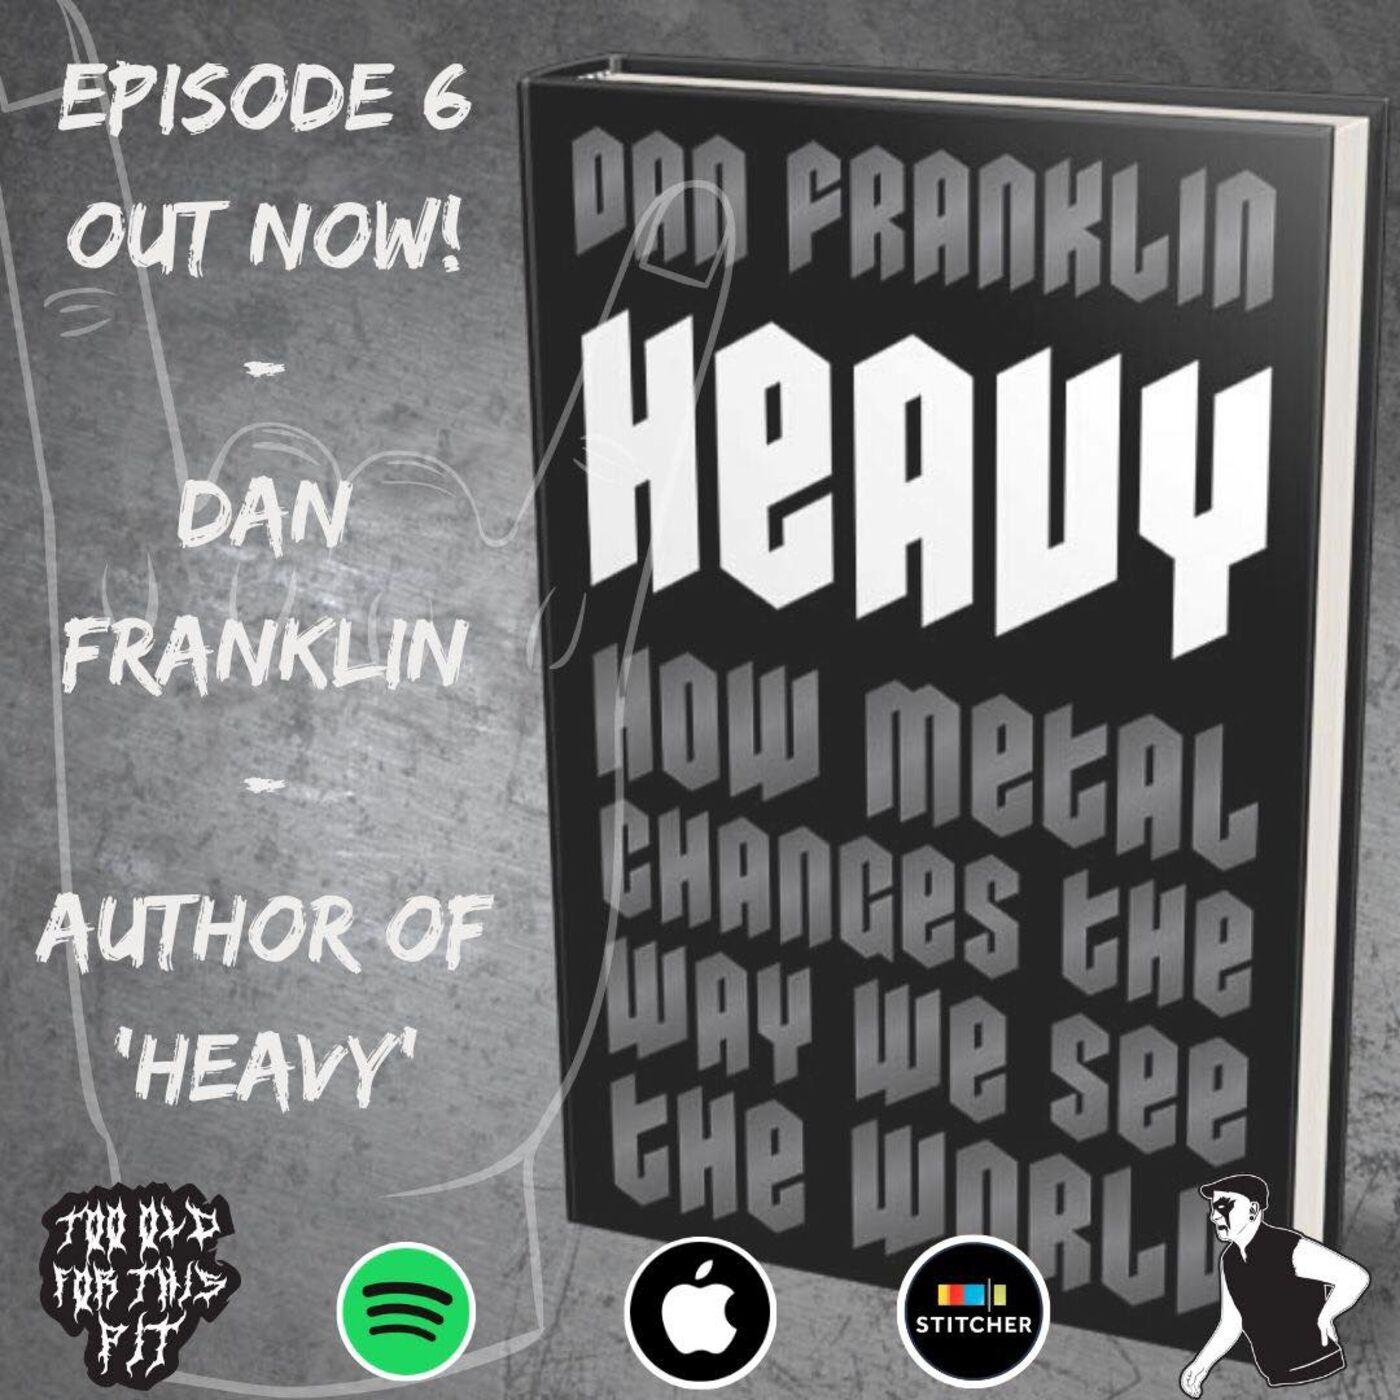 Episode 6 - Dan Franklin (Author of 'Heavy')